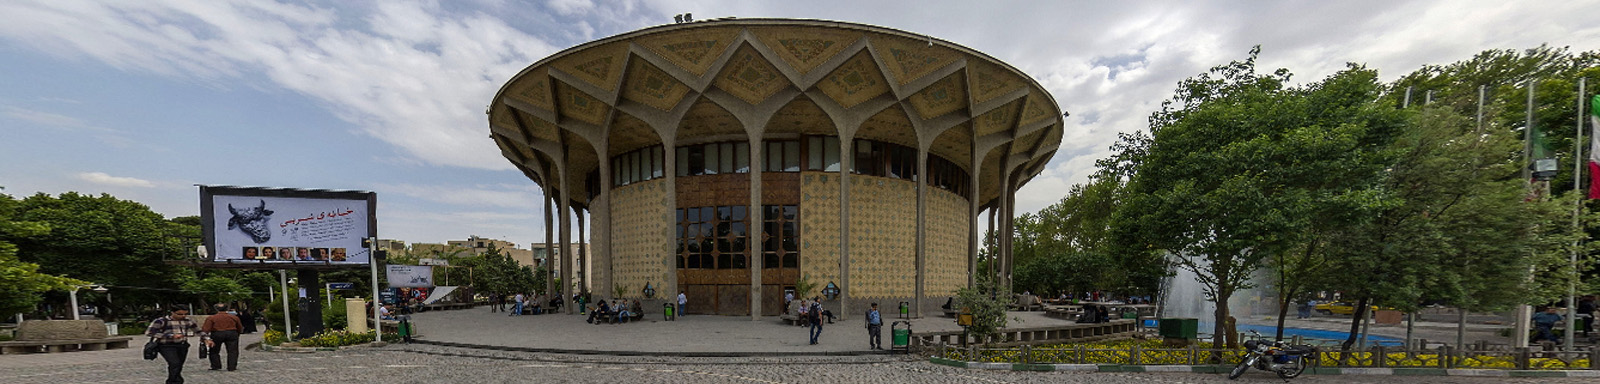 City Theater of Tehran-Tehran